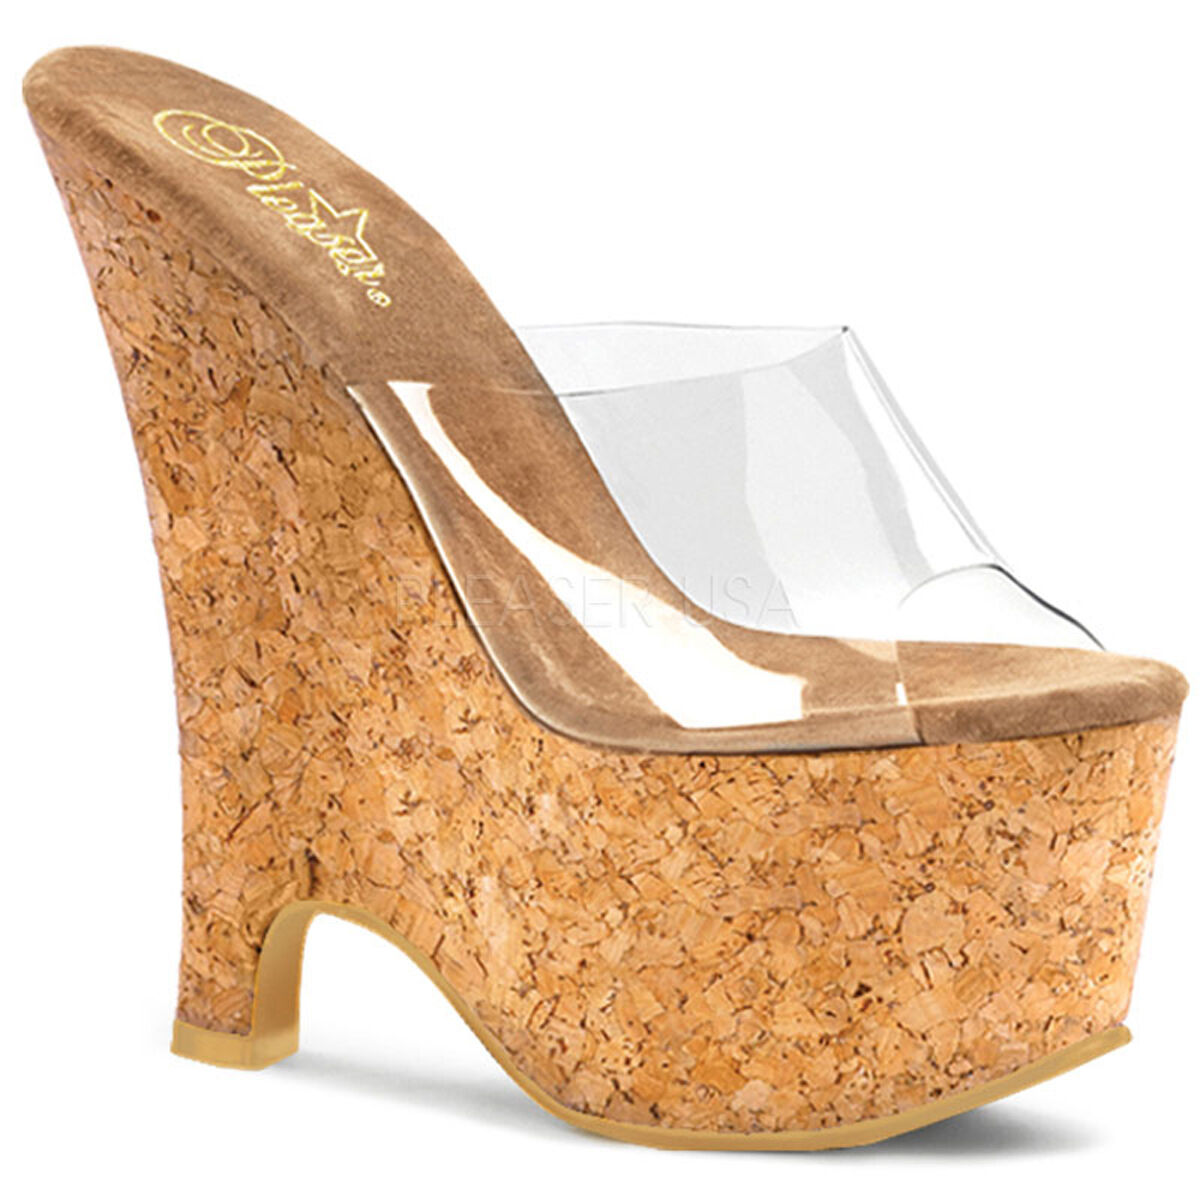 PLEASER Sexy Cork Platform Wedges 6 1 2 2 2  Heels Slip On Exotic shoes BEAU601 C CK cb78d4